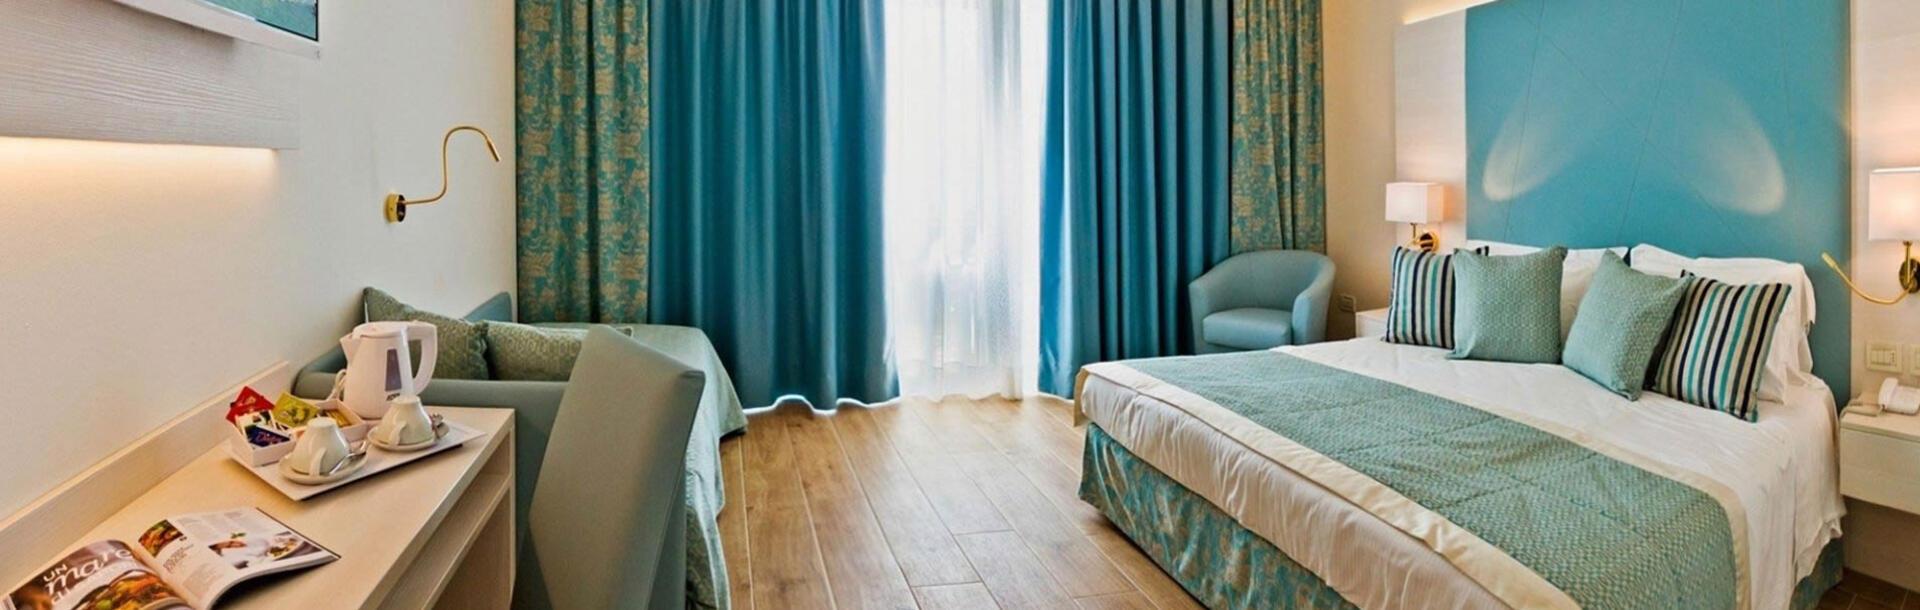 hotel-montecarlo pl junior-suite-bibione 014